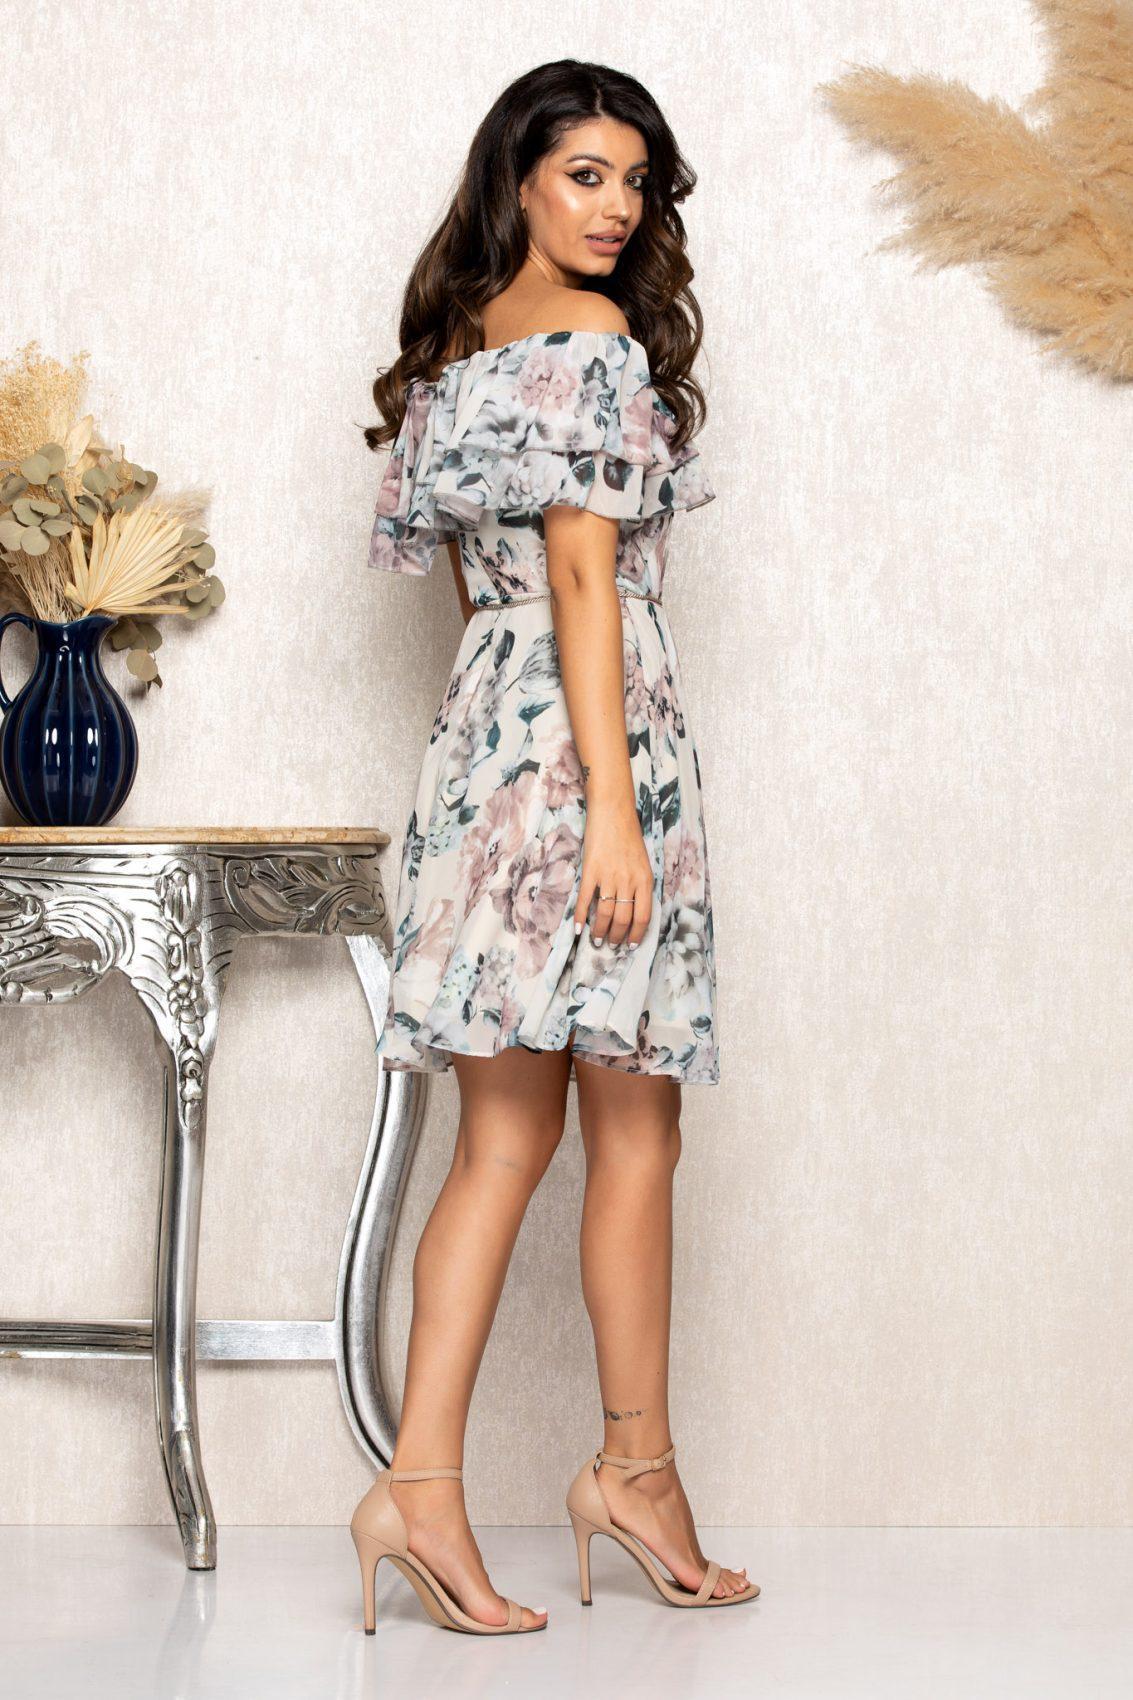 Nude Φλοράλ Φόρεμα Με Βολάν Jasmine B120 2